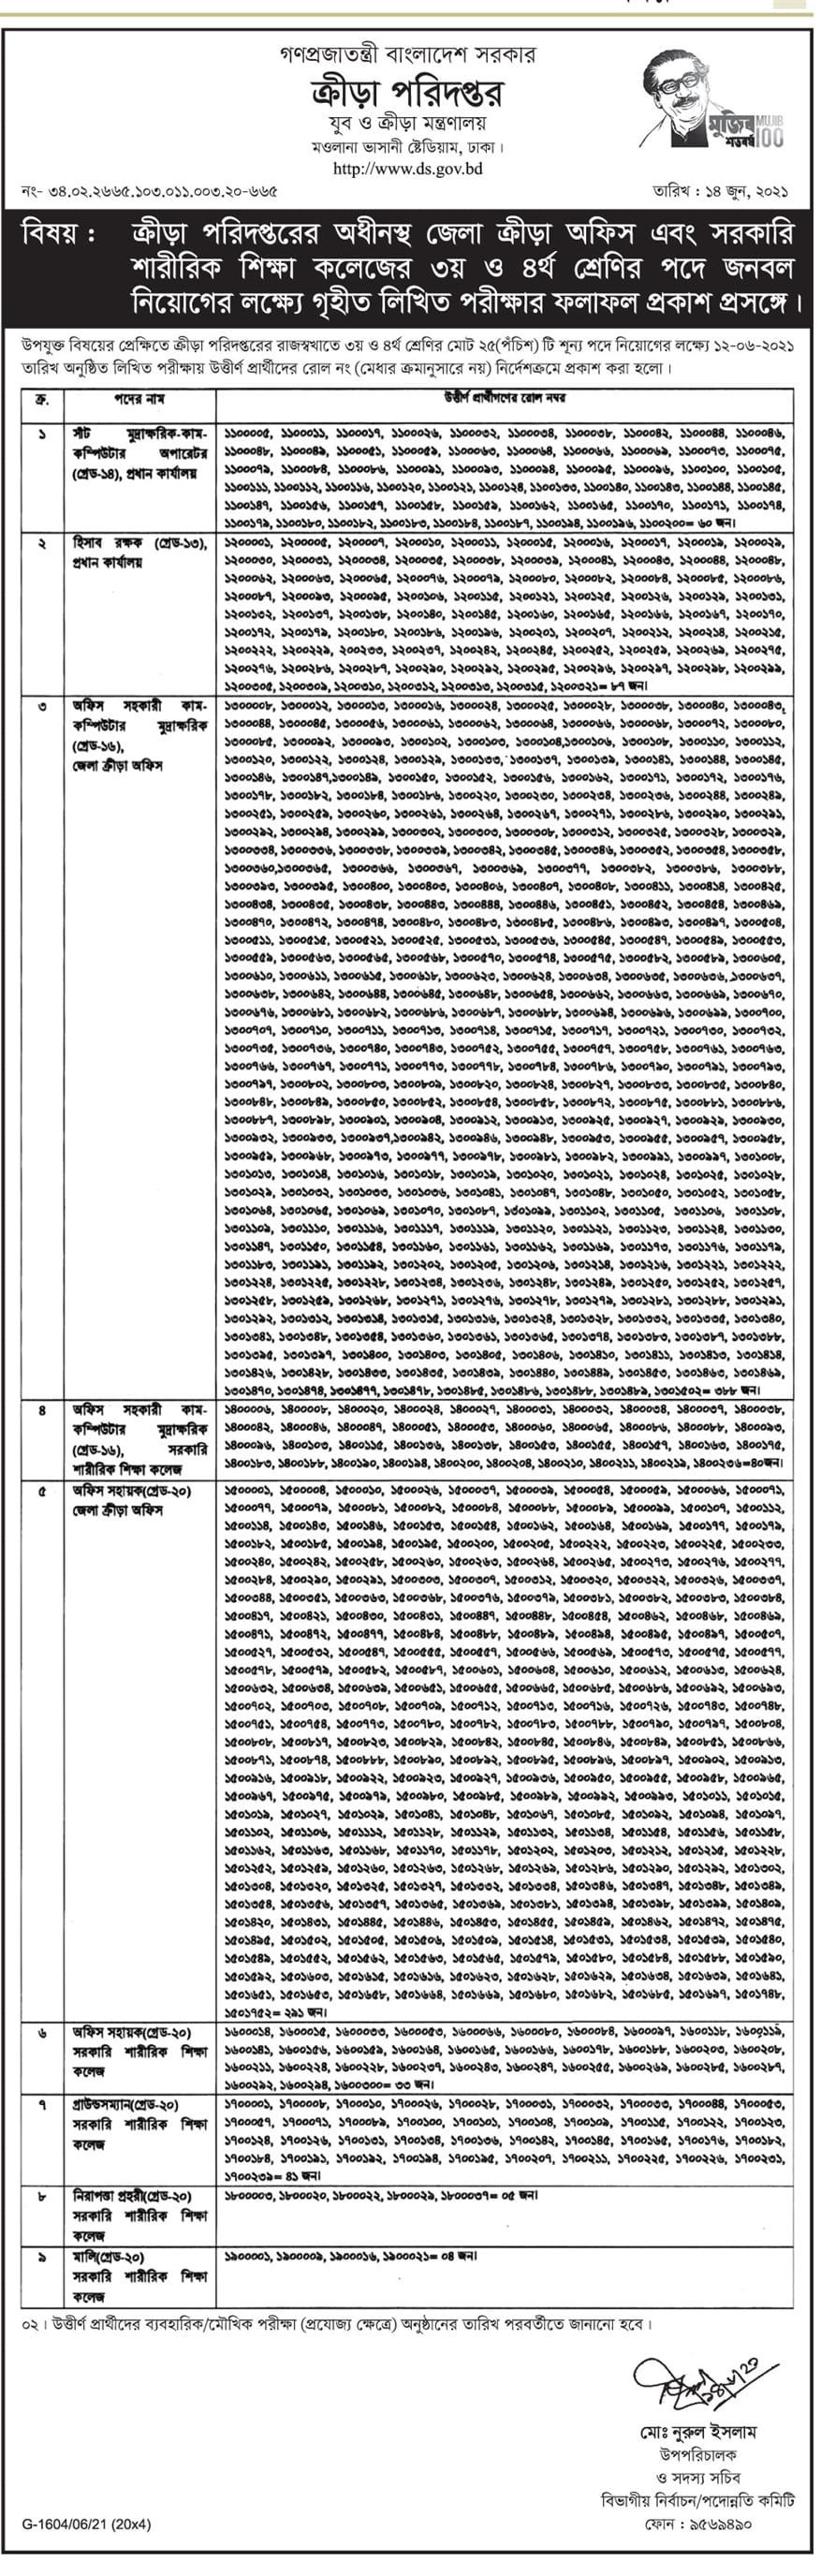 DS Exam Result 2021